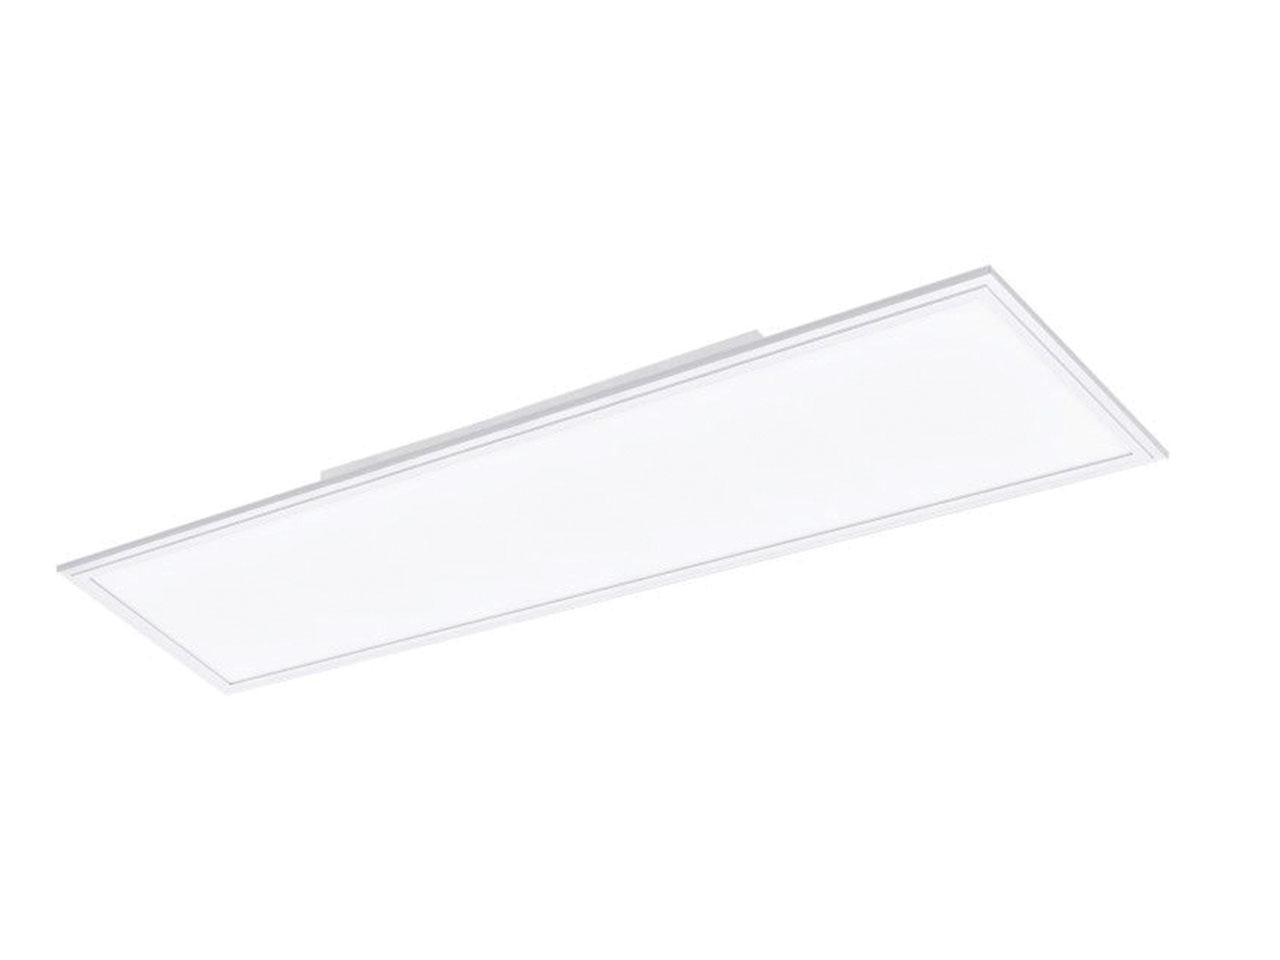 Náhradní LED panel TWEEN LIGHT LED-Panel, 120 x 30 cm